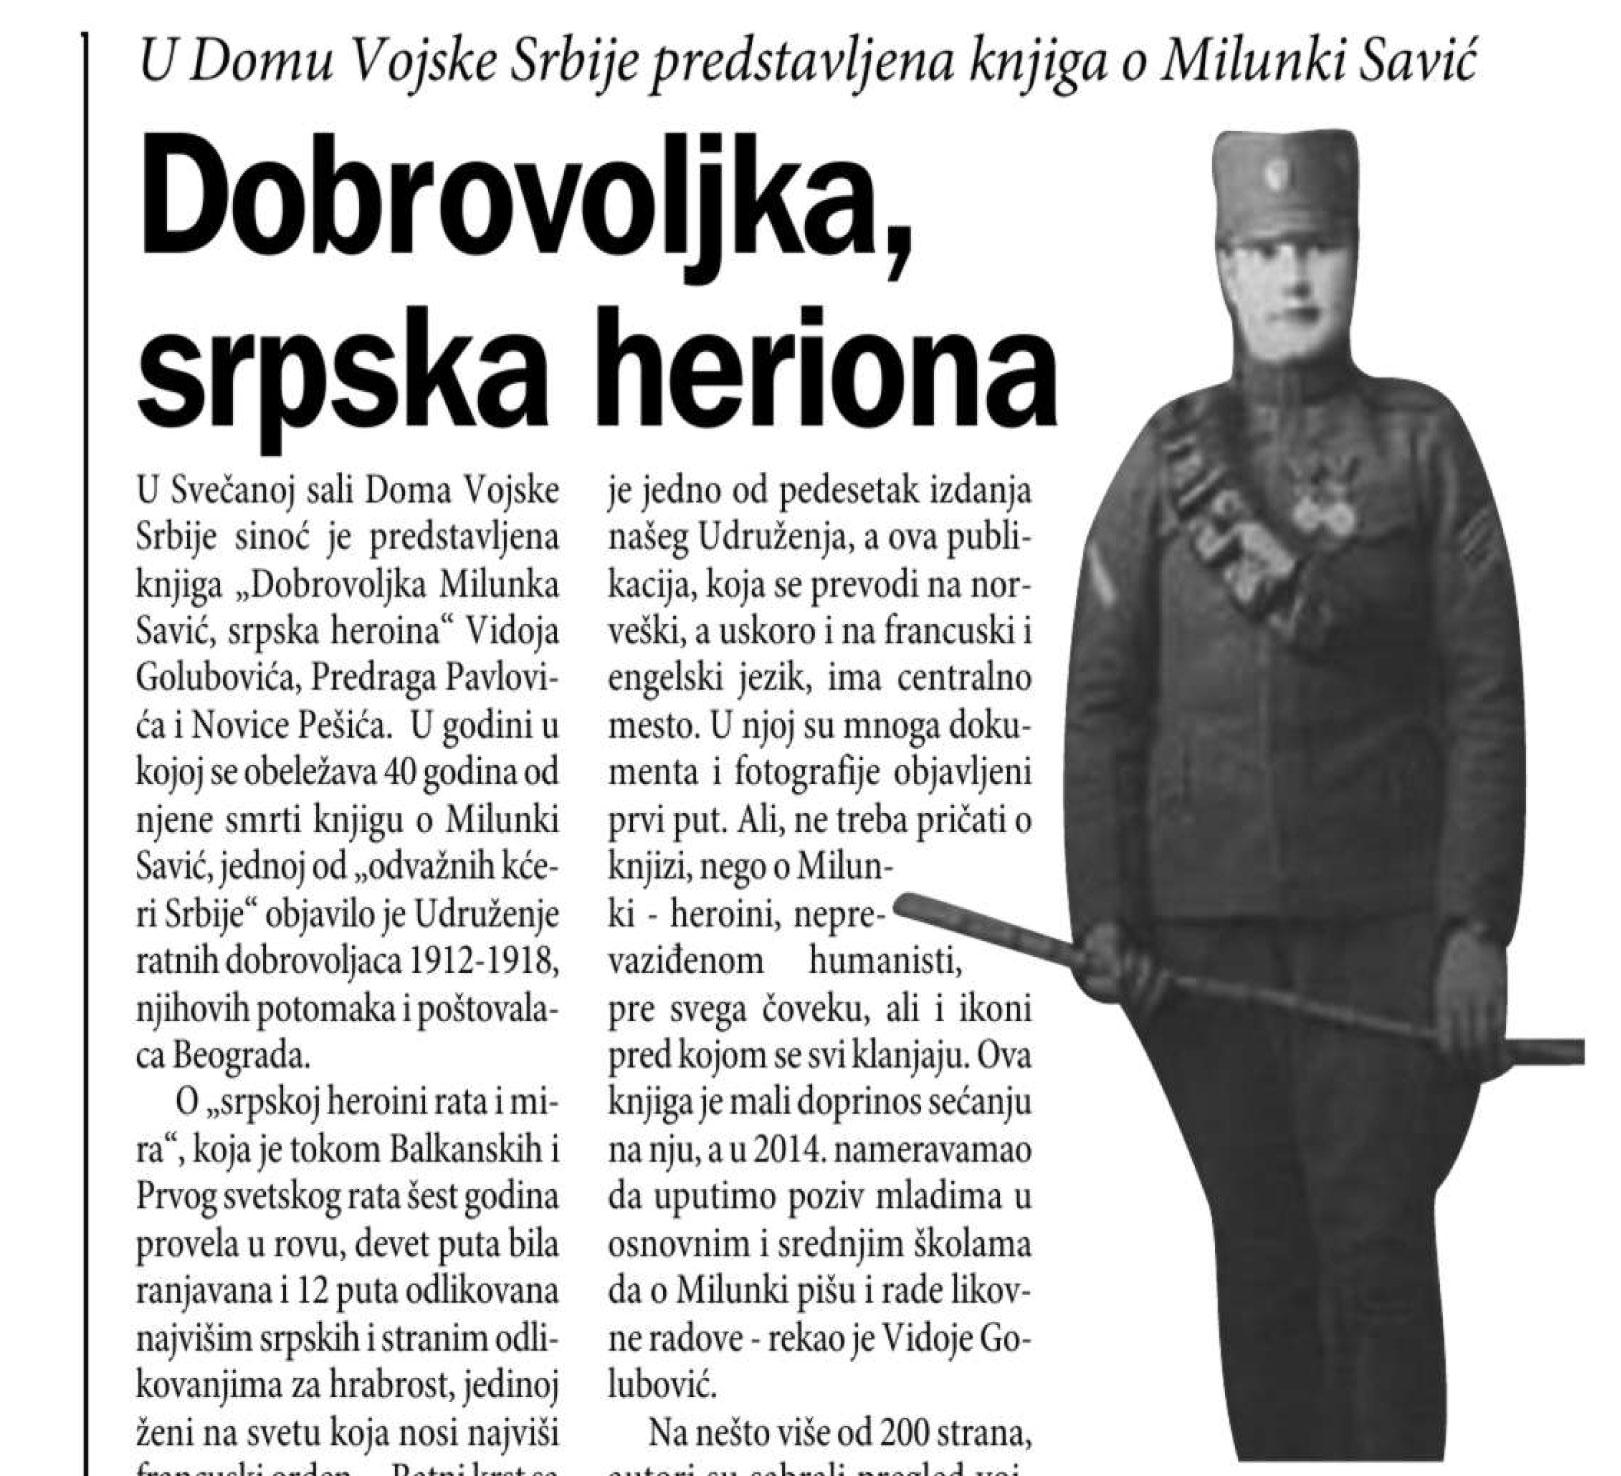 Добровољка српска хероина